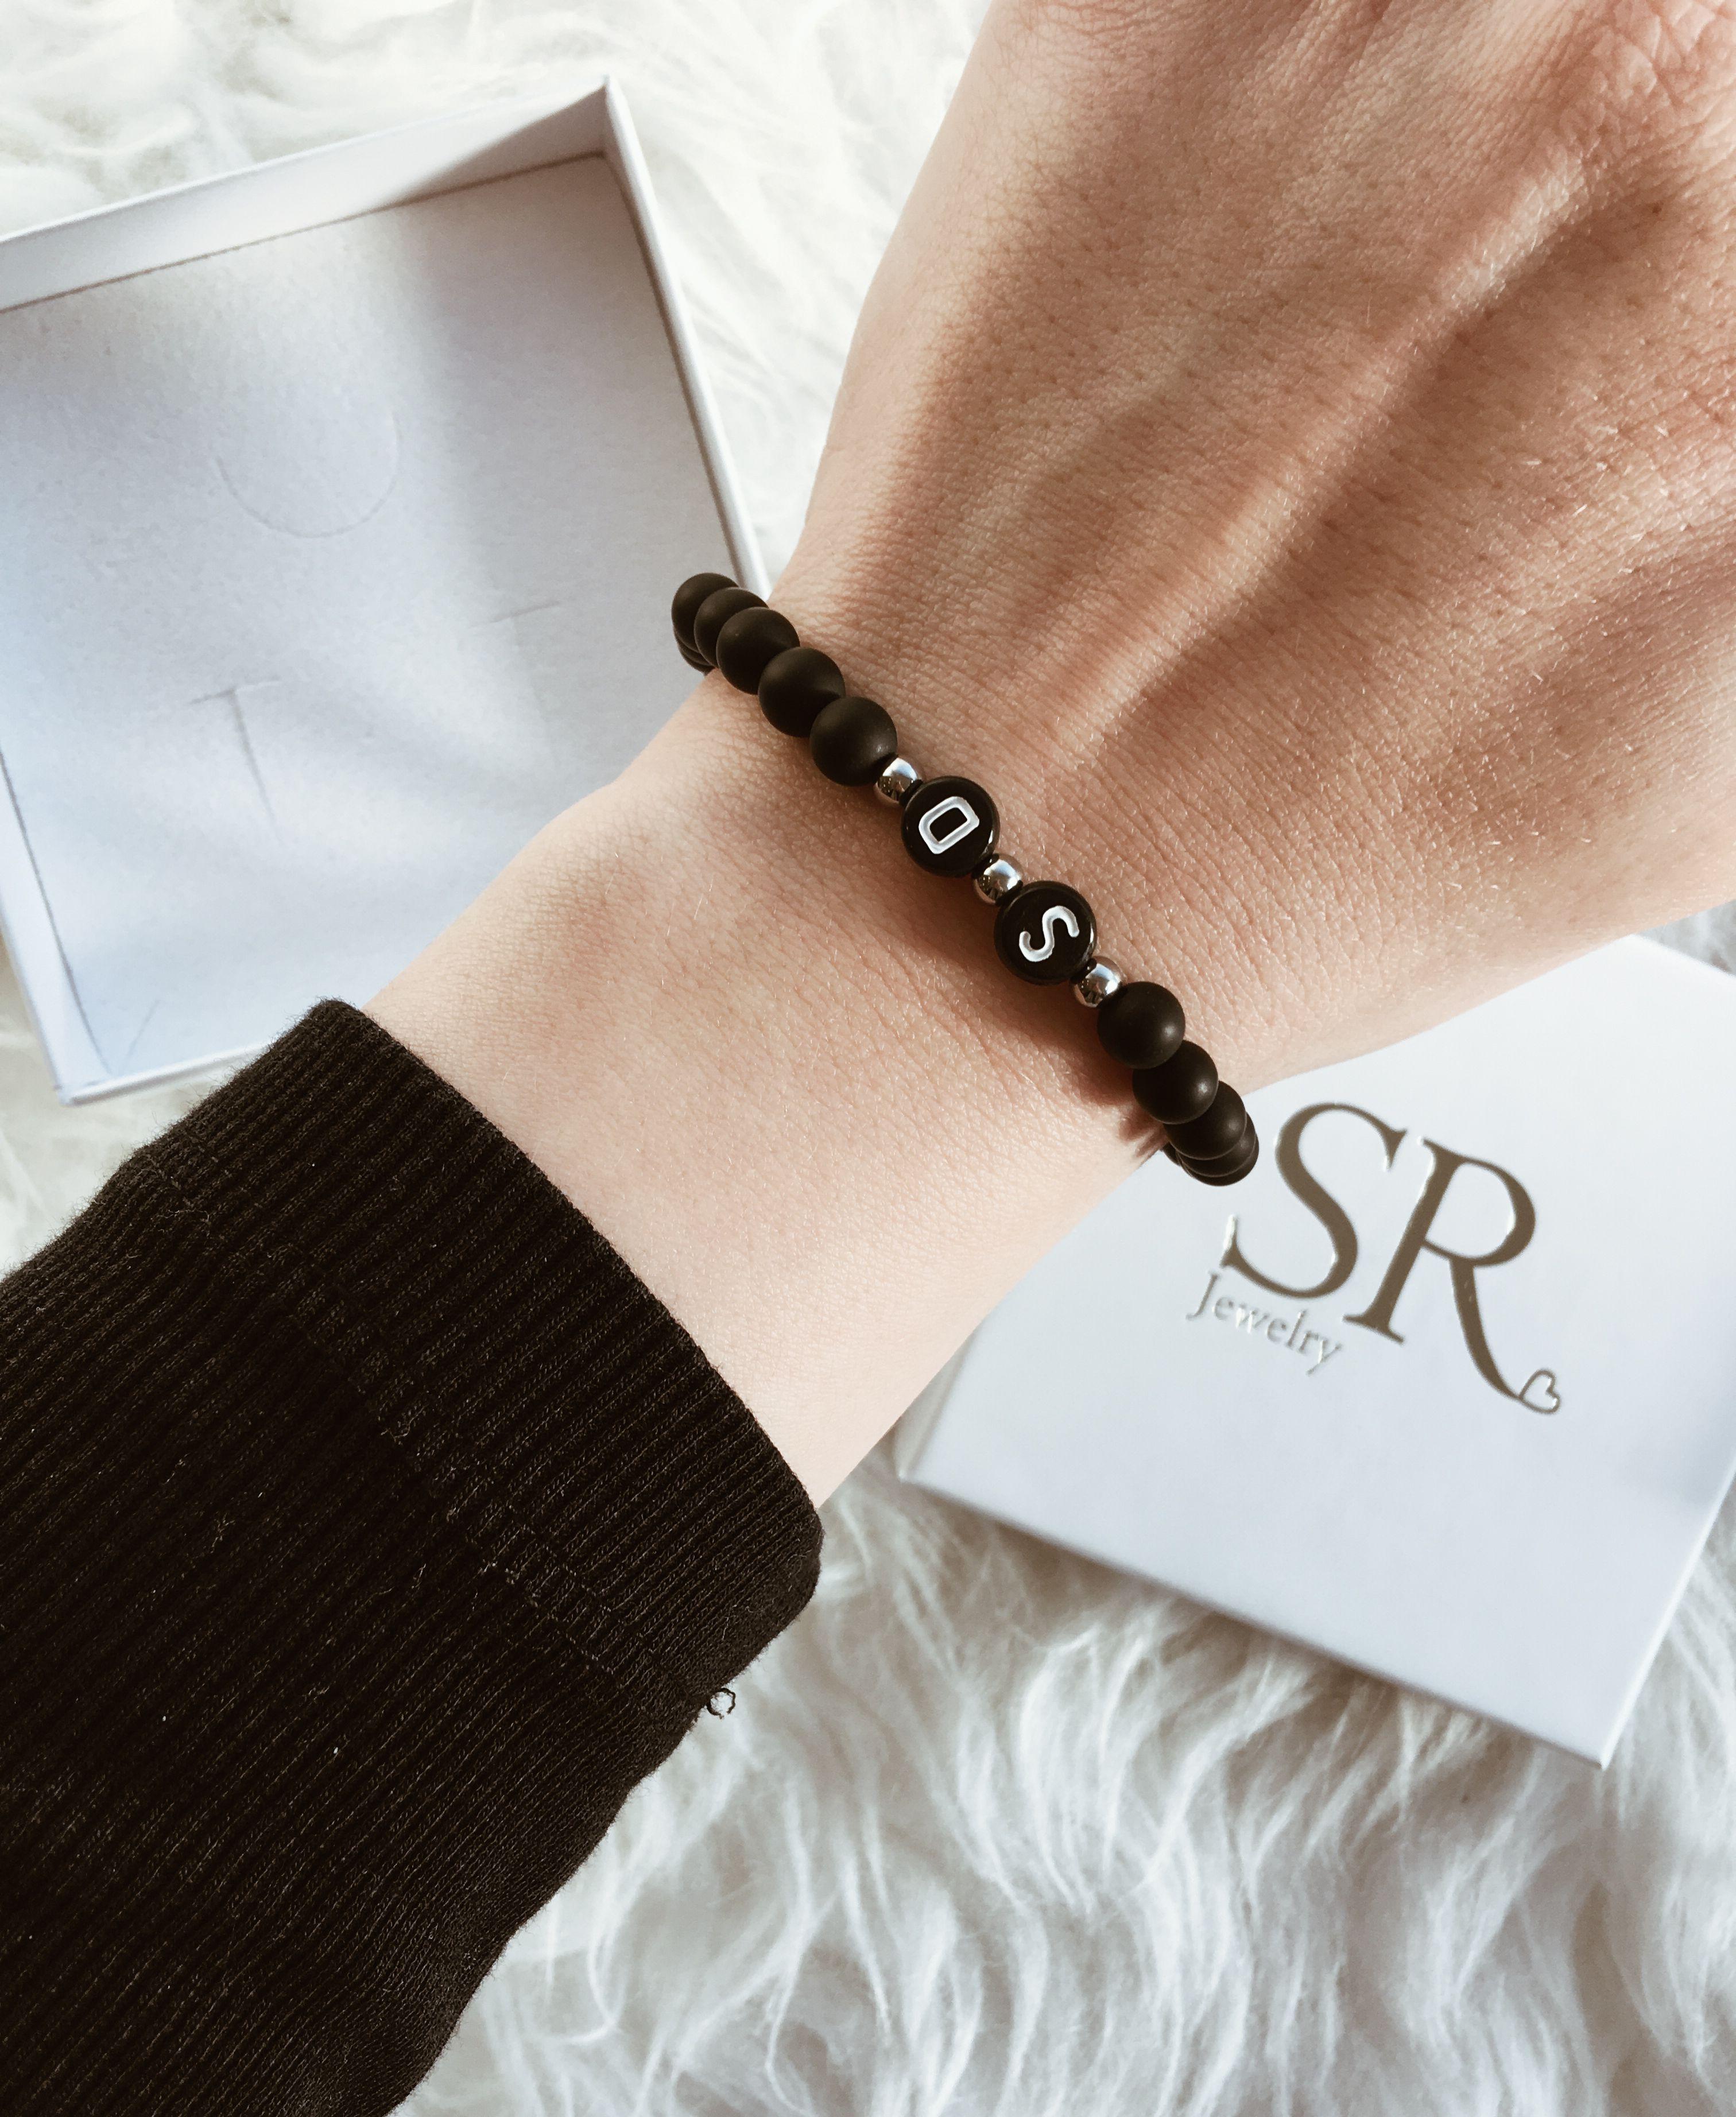 Partnerarmbander Mit Gravur In 2020 Armband Fur Freundin Partner Armbander Armband